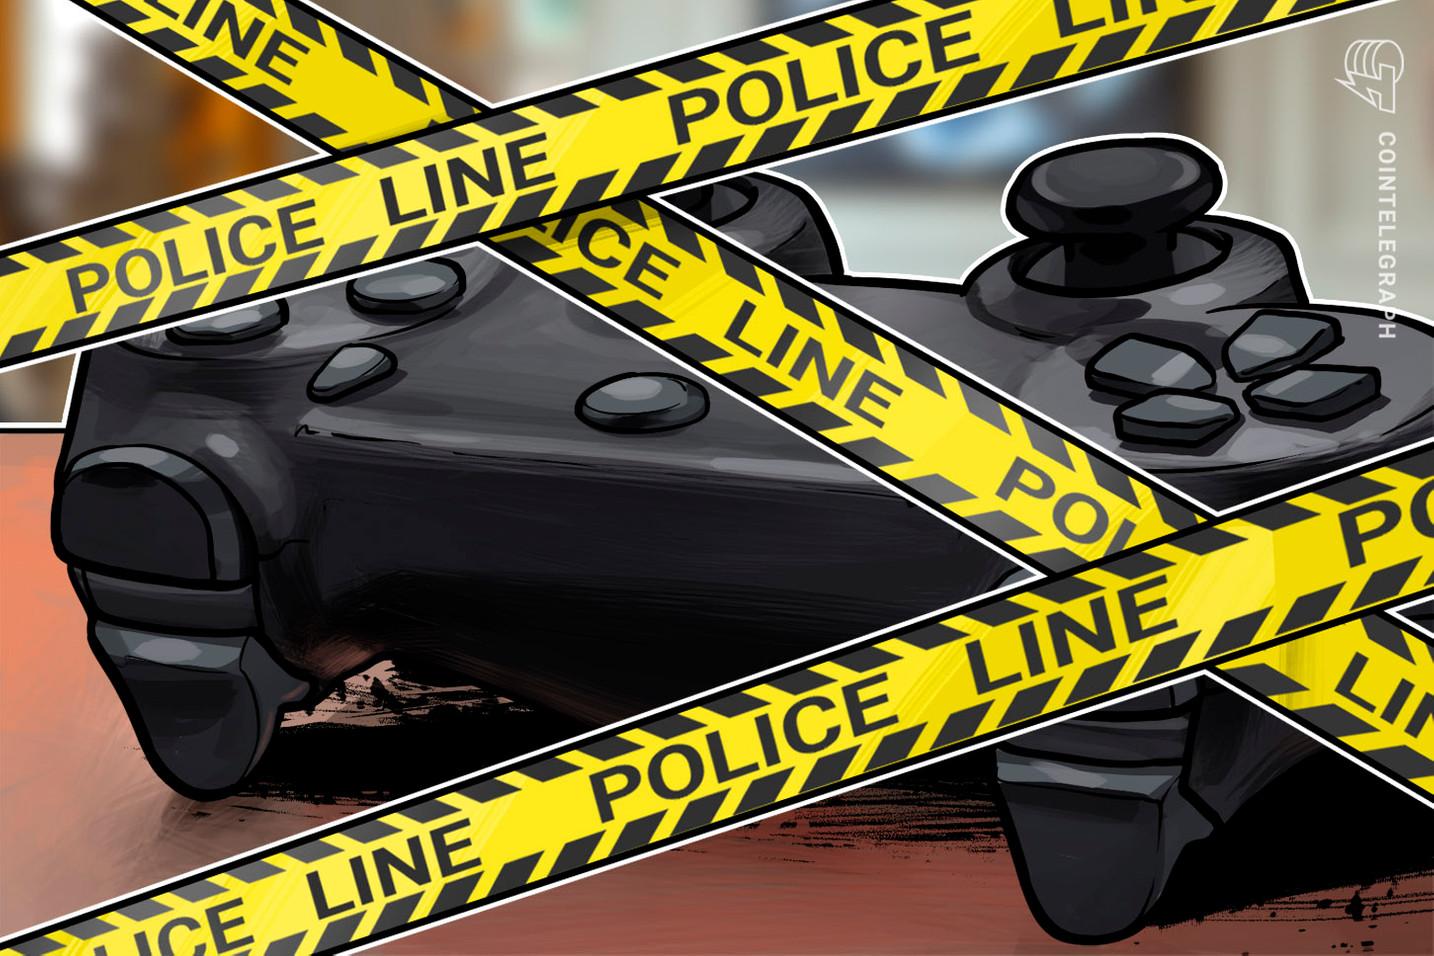 Las PS4 incautadas en Ucrania se usaban para conseguir monedas y sobres de FIFA, no para minar criptomonedas